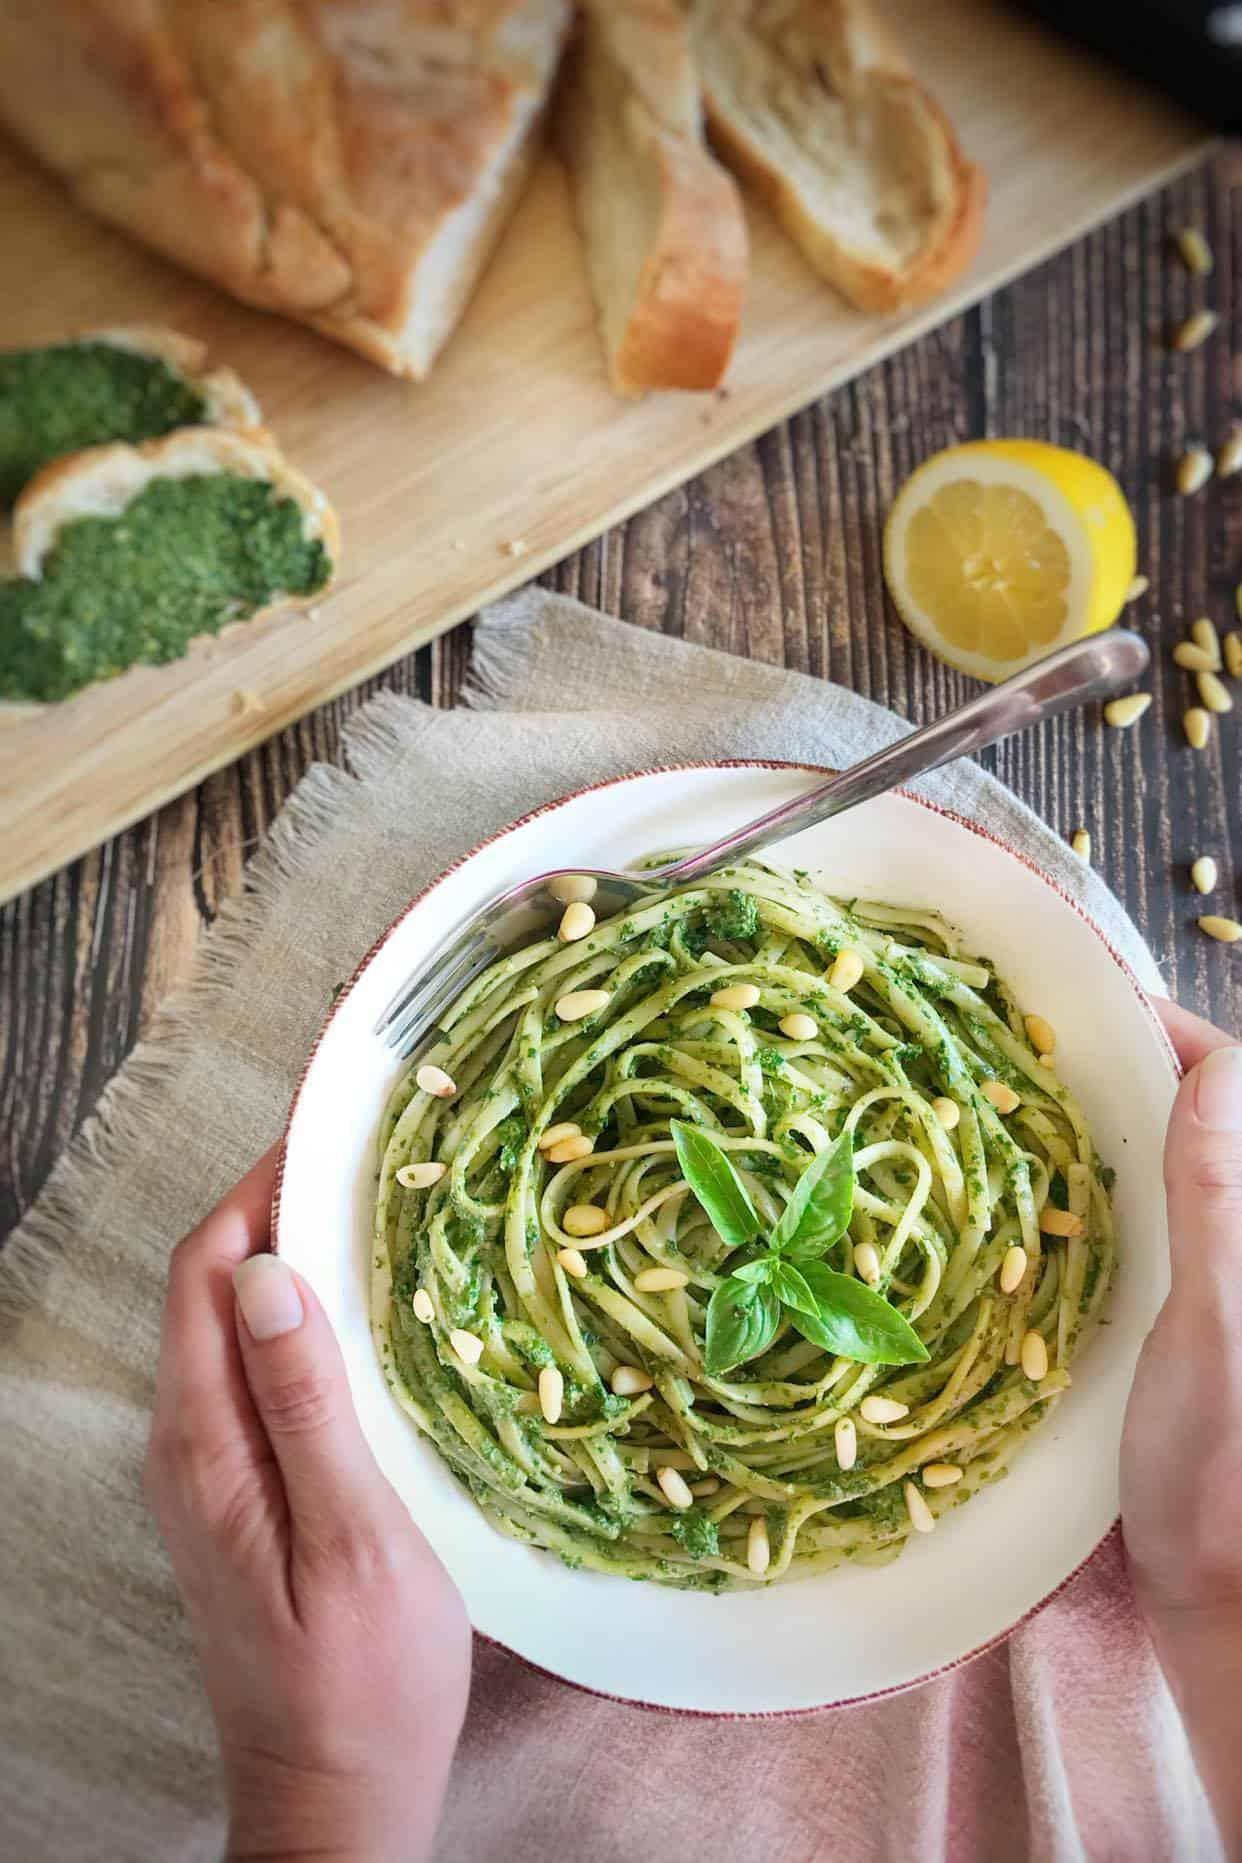 Low fat vegan basil pesto on linguine.